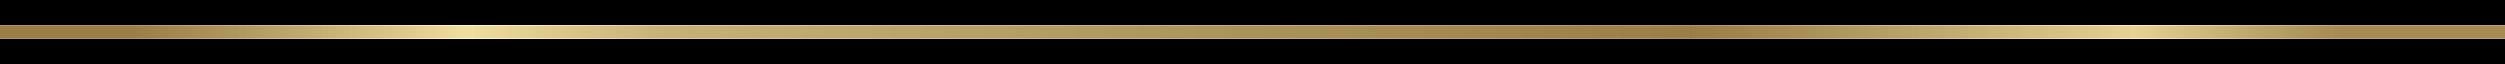 Zerella logo gold strip.png